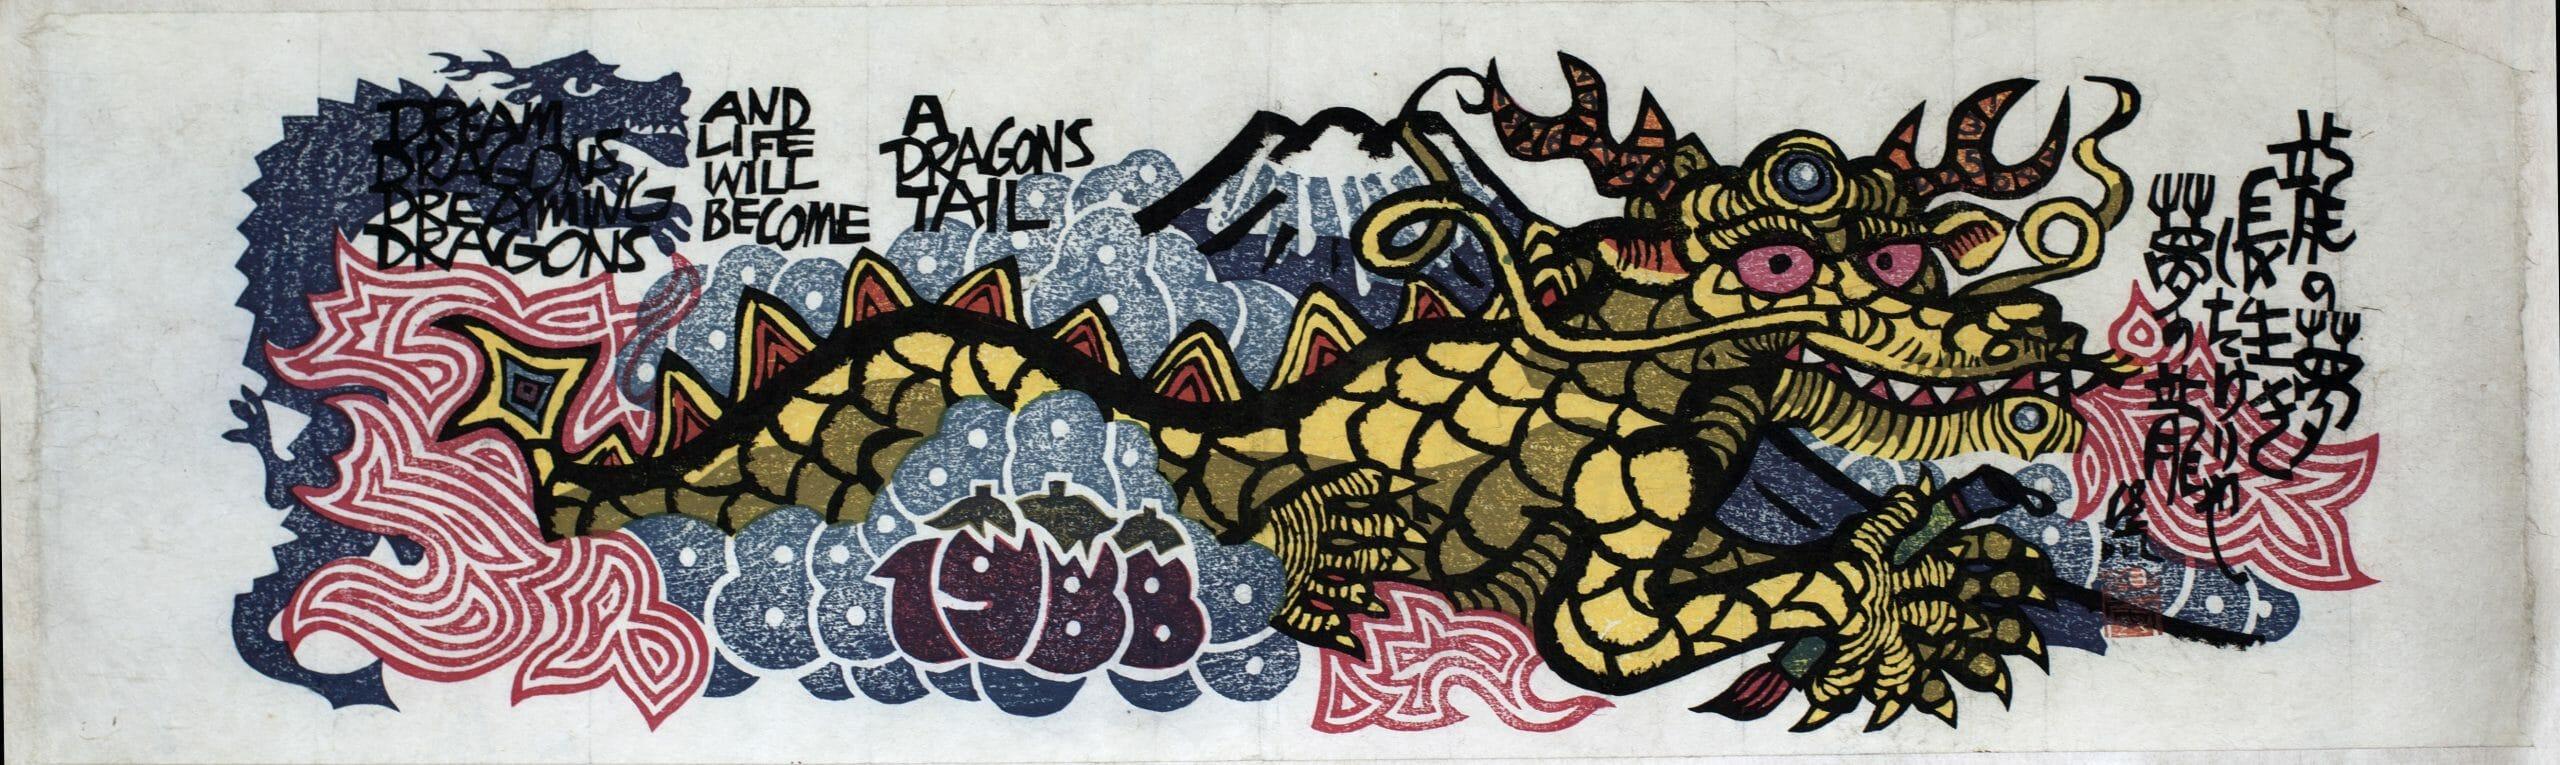 Dragons Tail